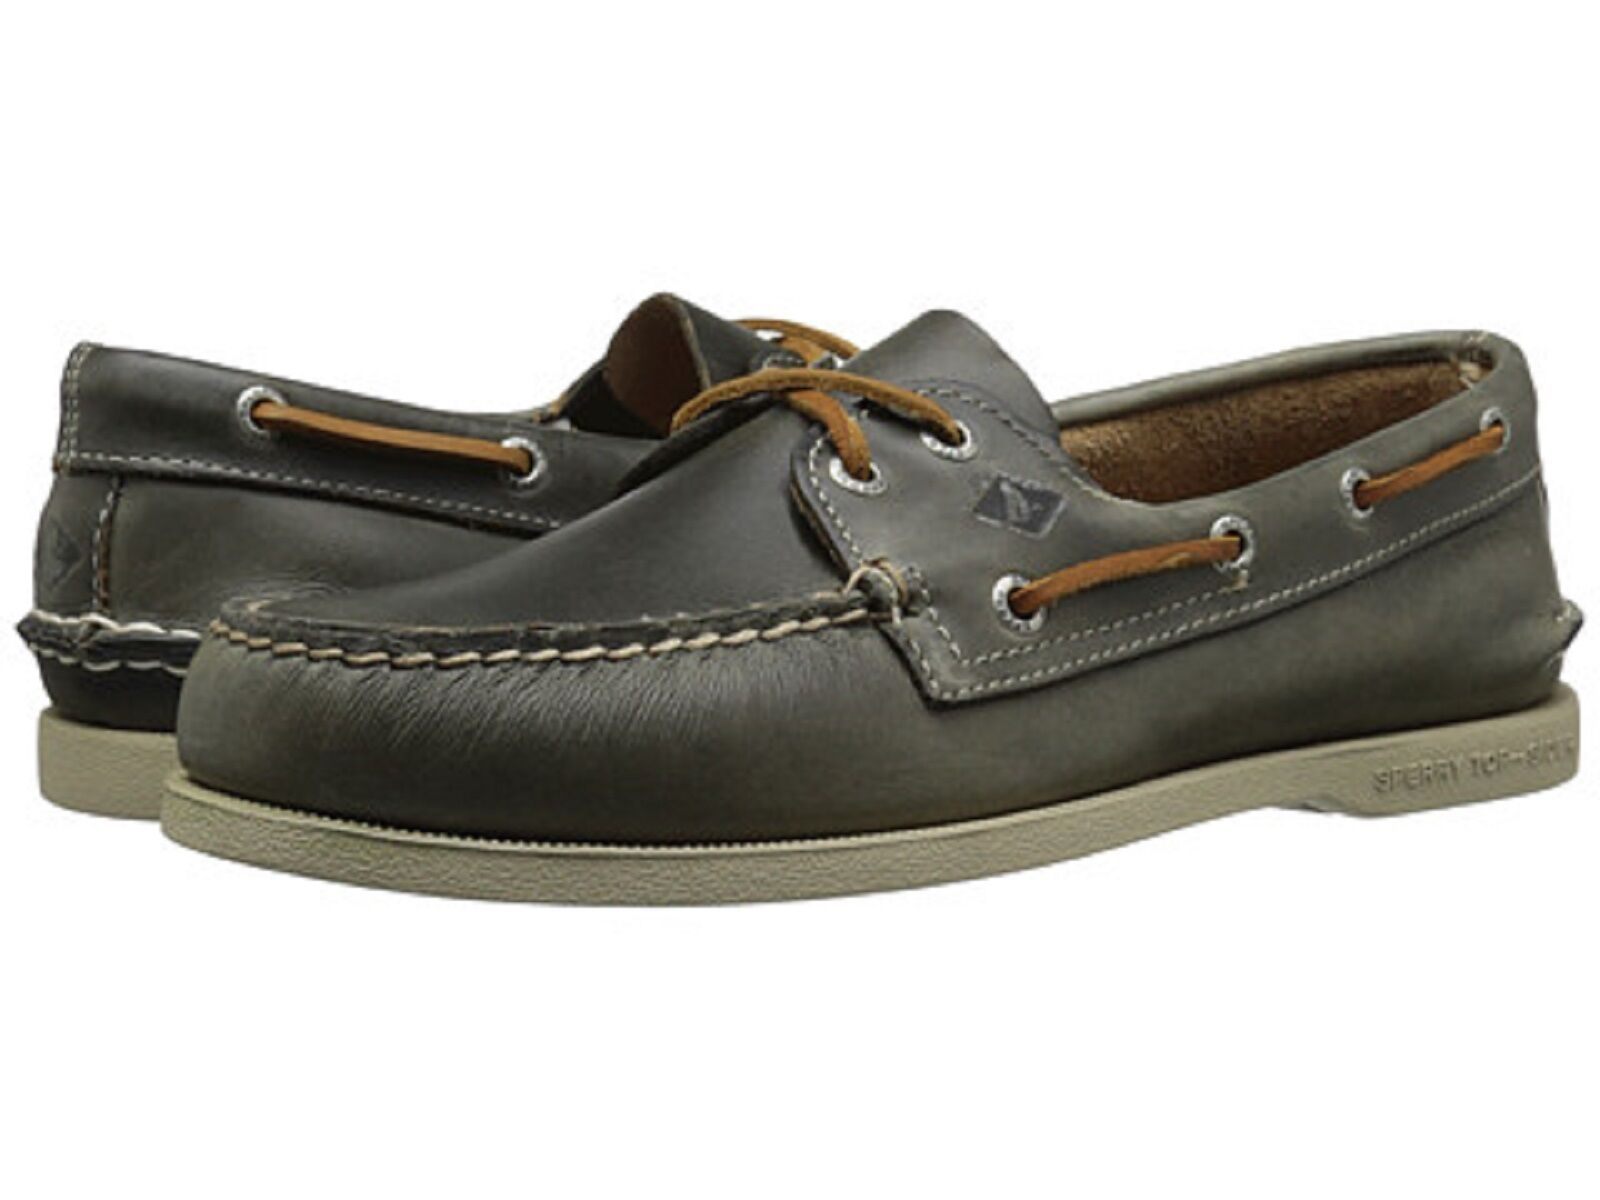 promozioni SPERRY SPERRY SPERRY 'A O WATERLOO' 2-Eyelet grigio Brn Uomo Leather Boat scarpe  Sz. 9 M NIB  negozio d'offerta